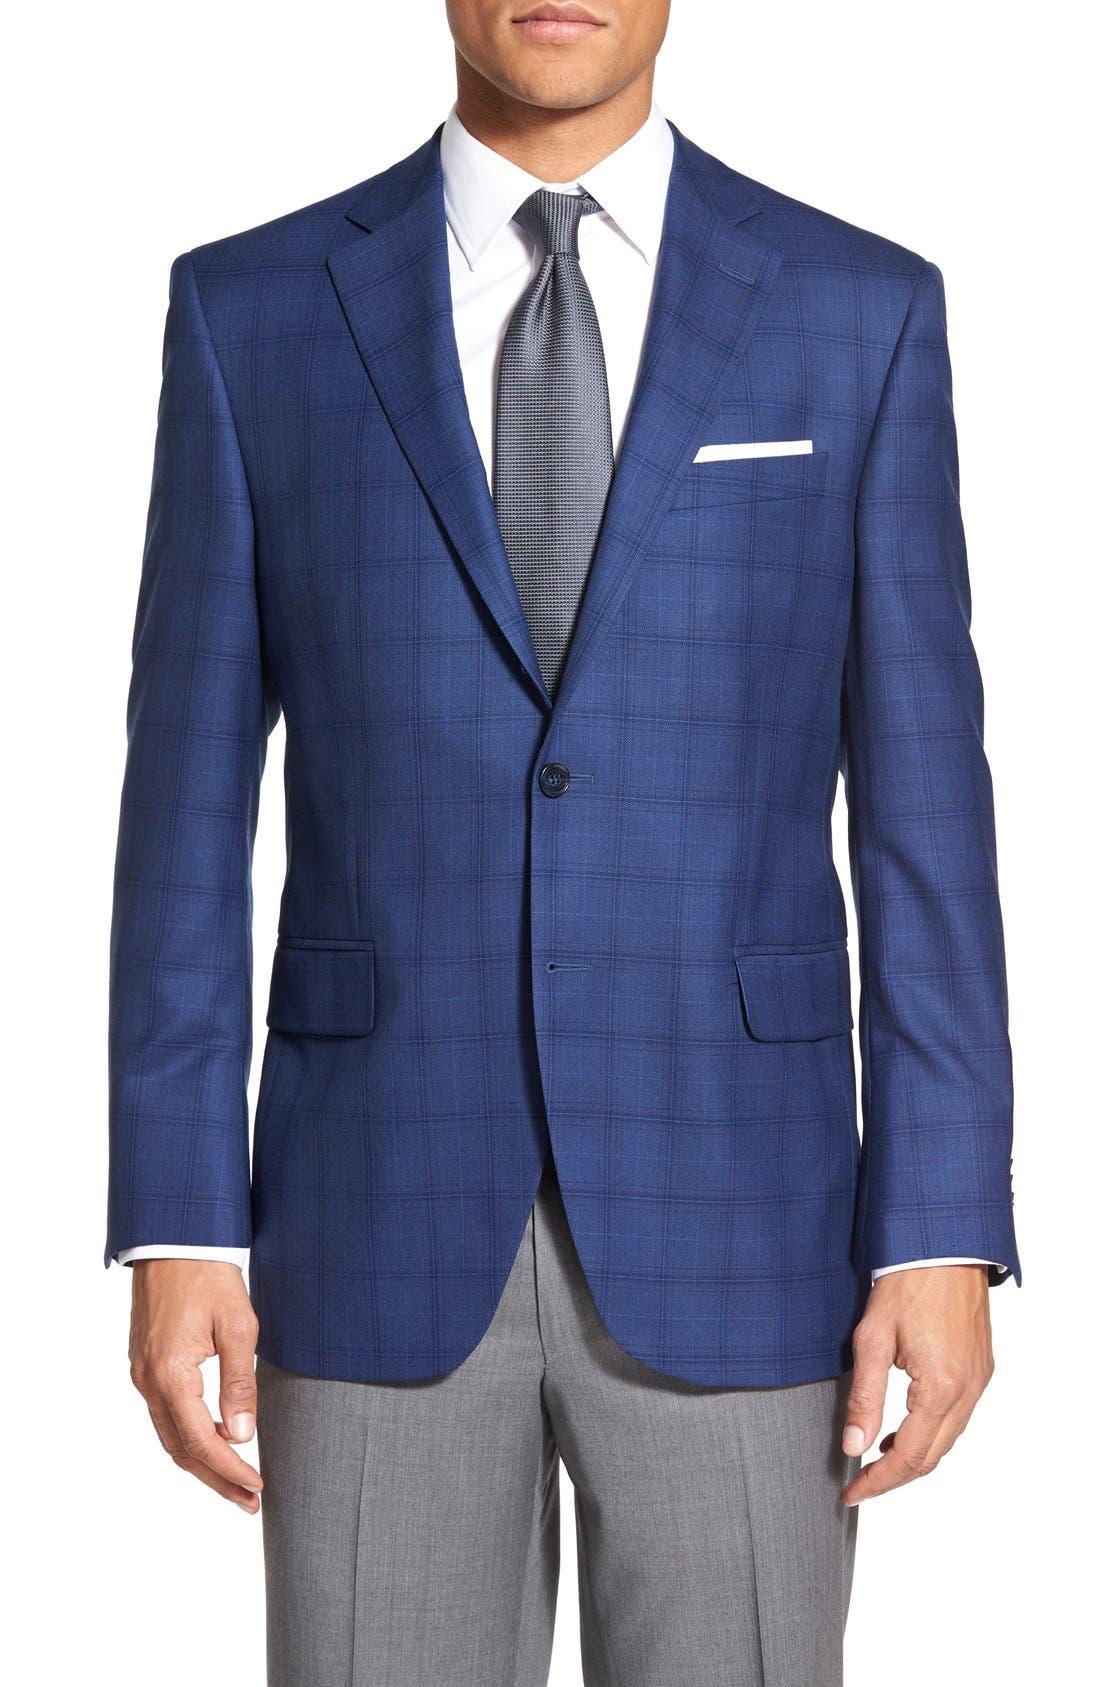 Alternate Image 1 Selected - Peter Millar 'Flynn' Classic Fit Plaid Wool Sport Coat